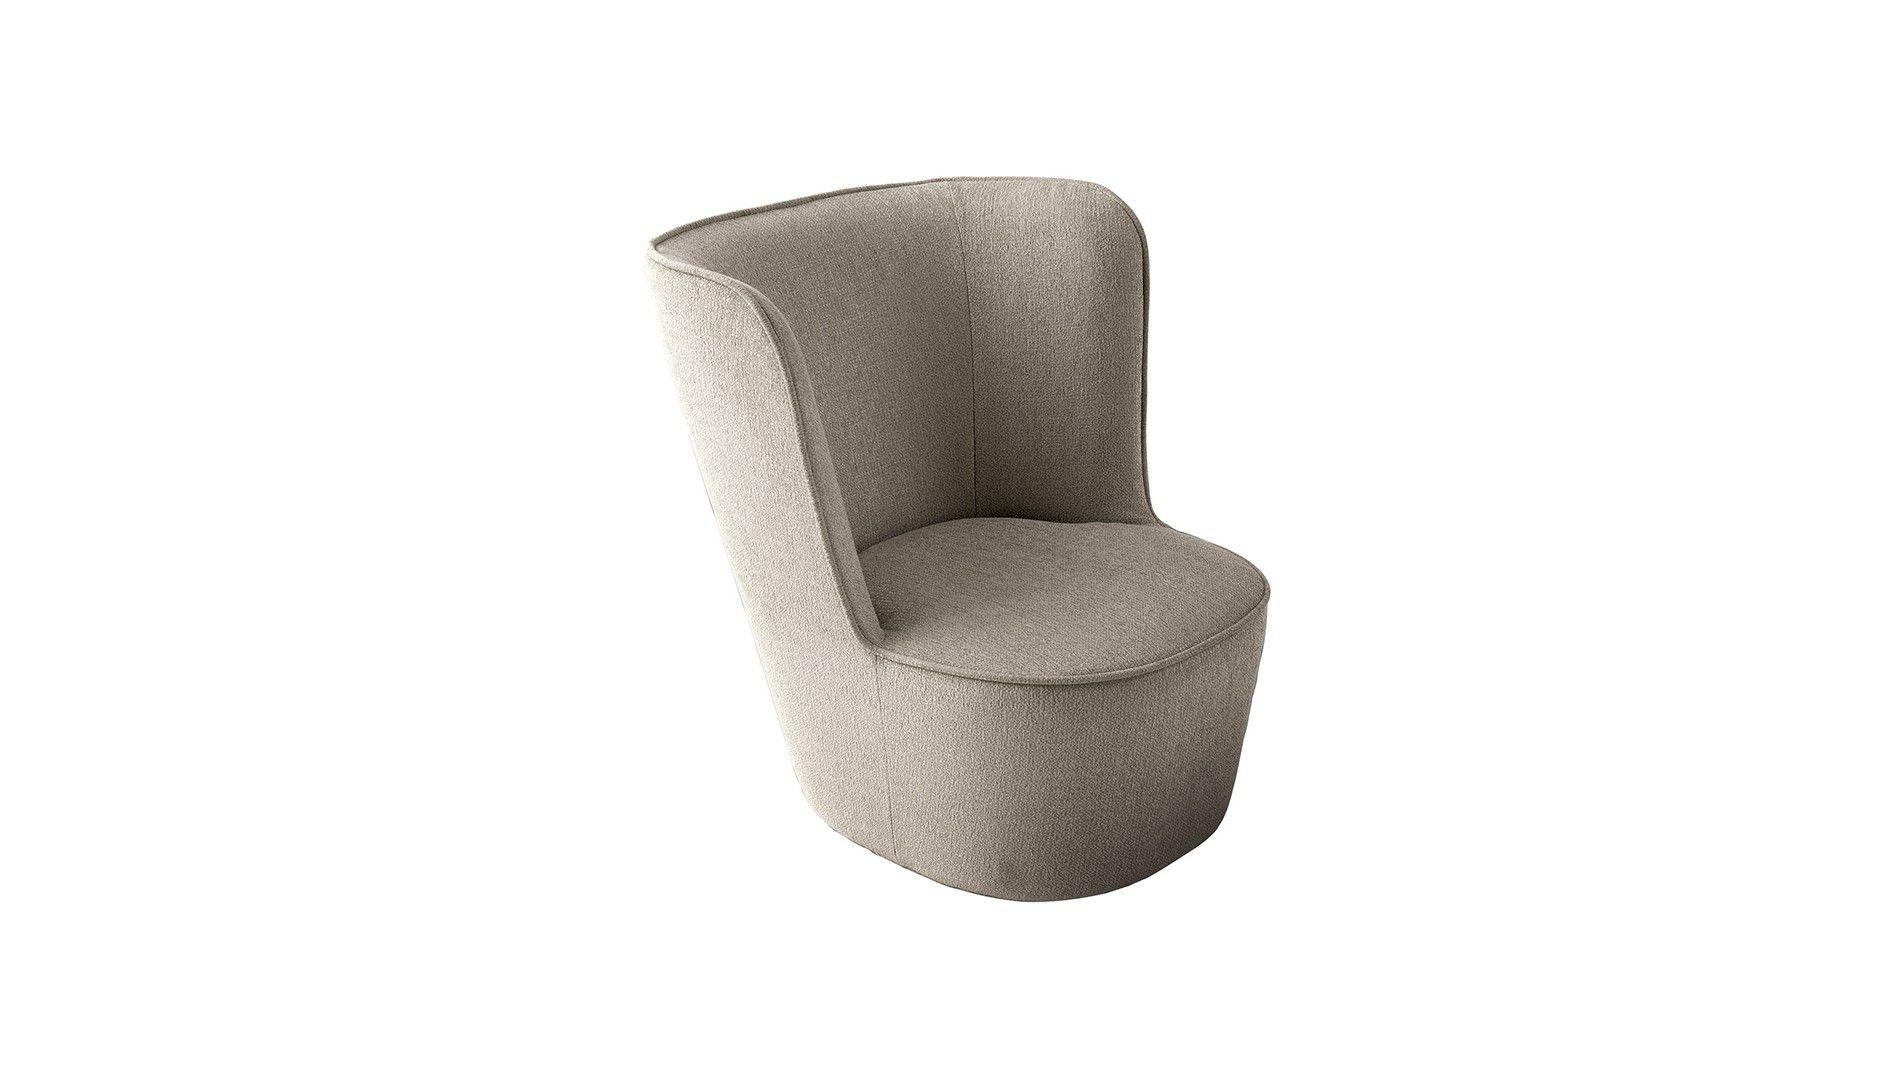 Buy Casamilano Baby Royal Armchair Online at LuxDeco. Let ...